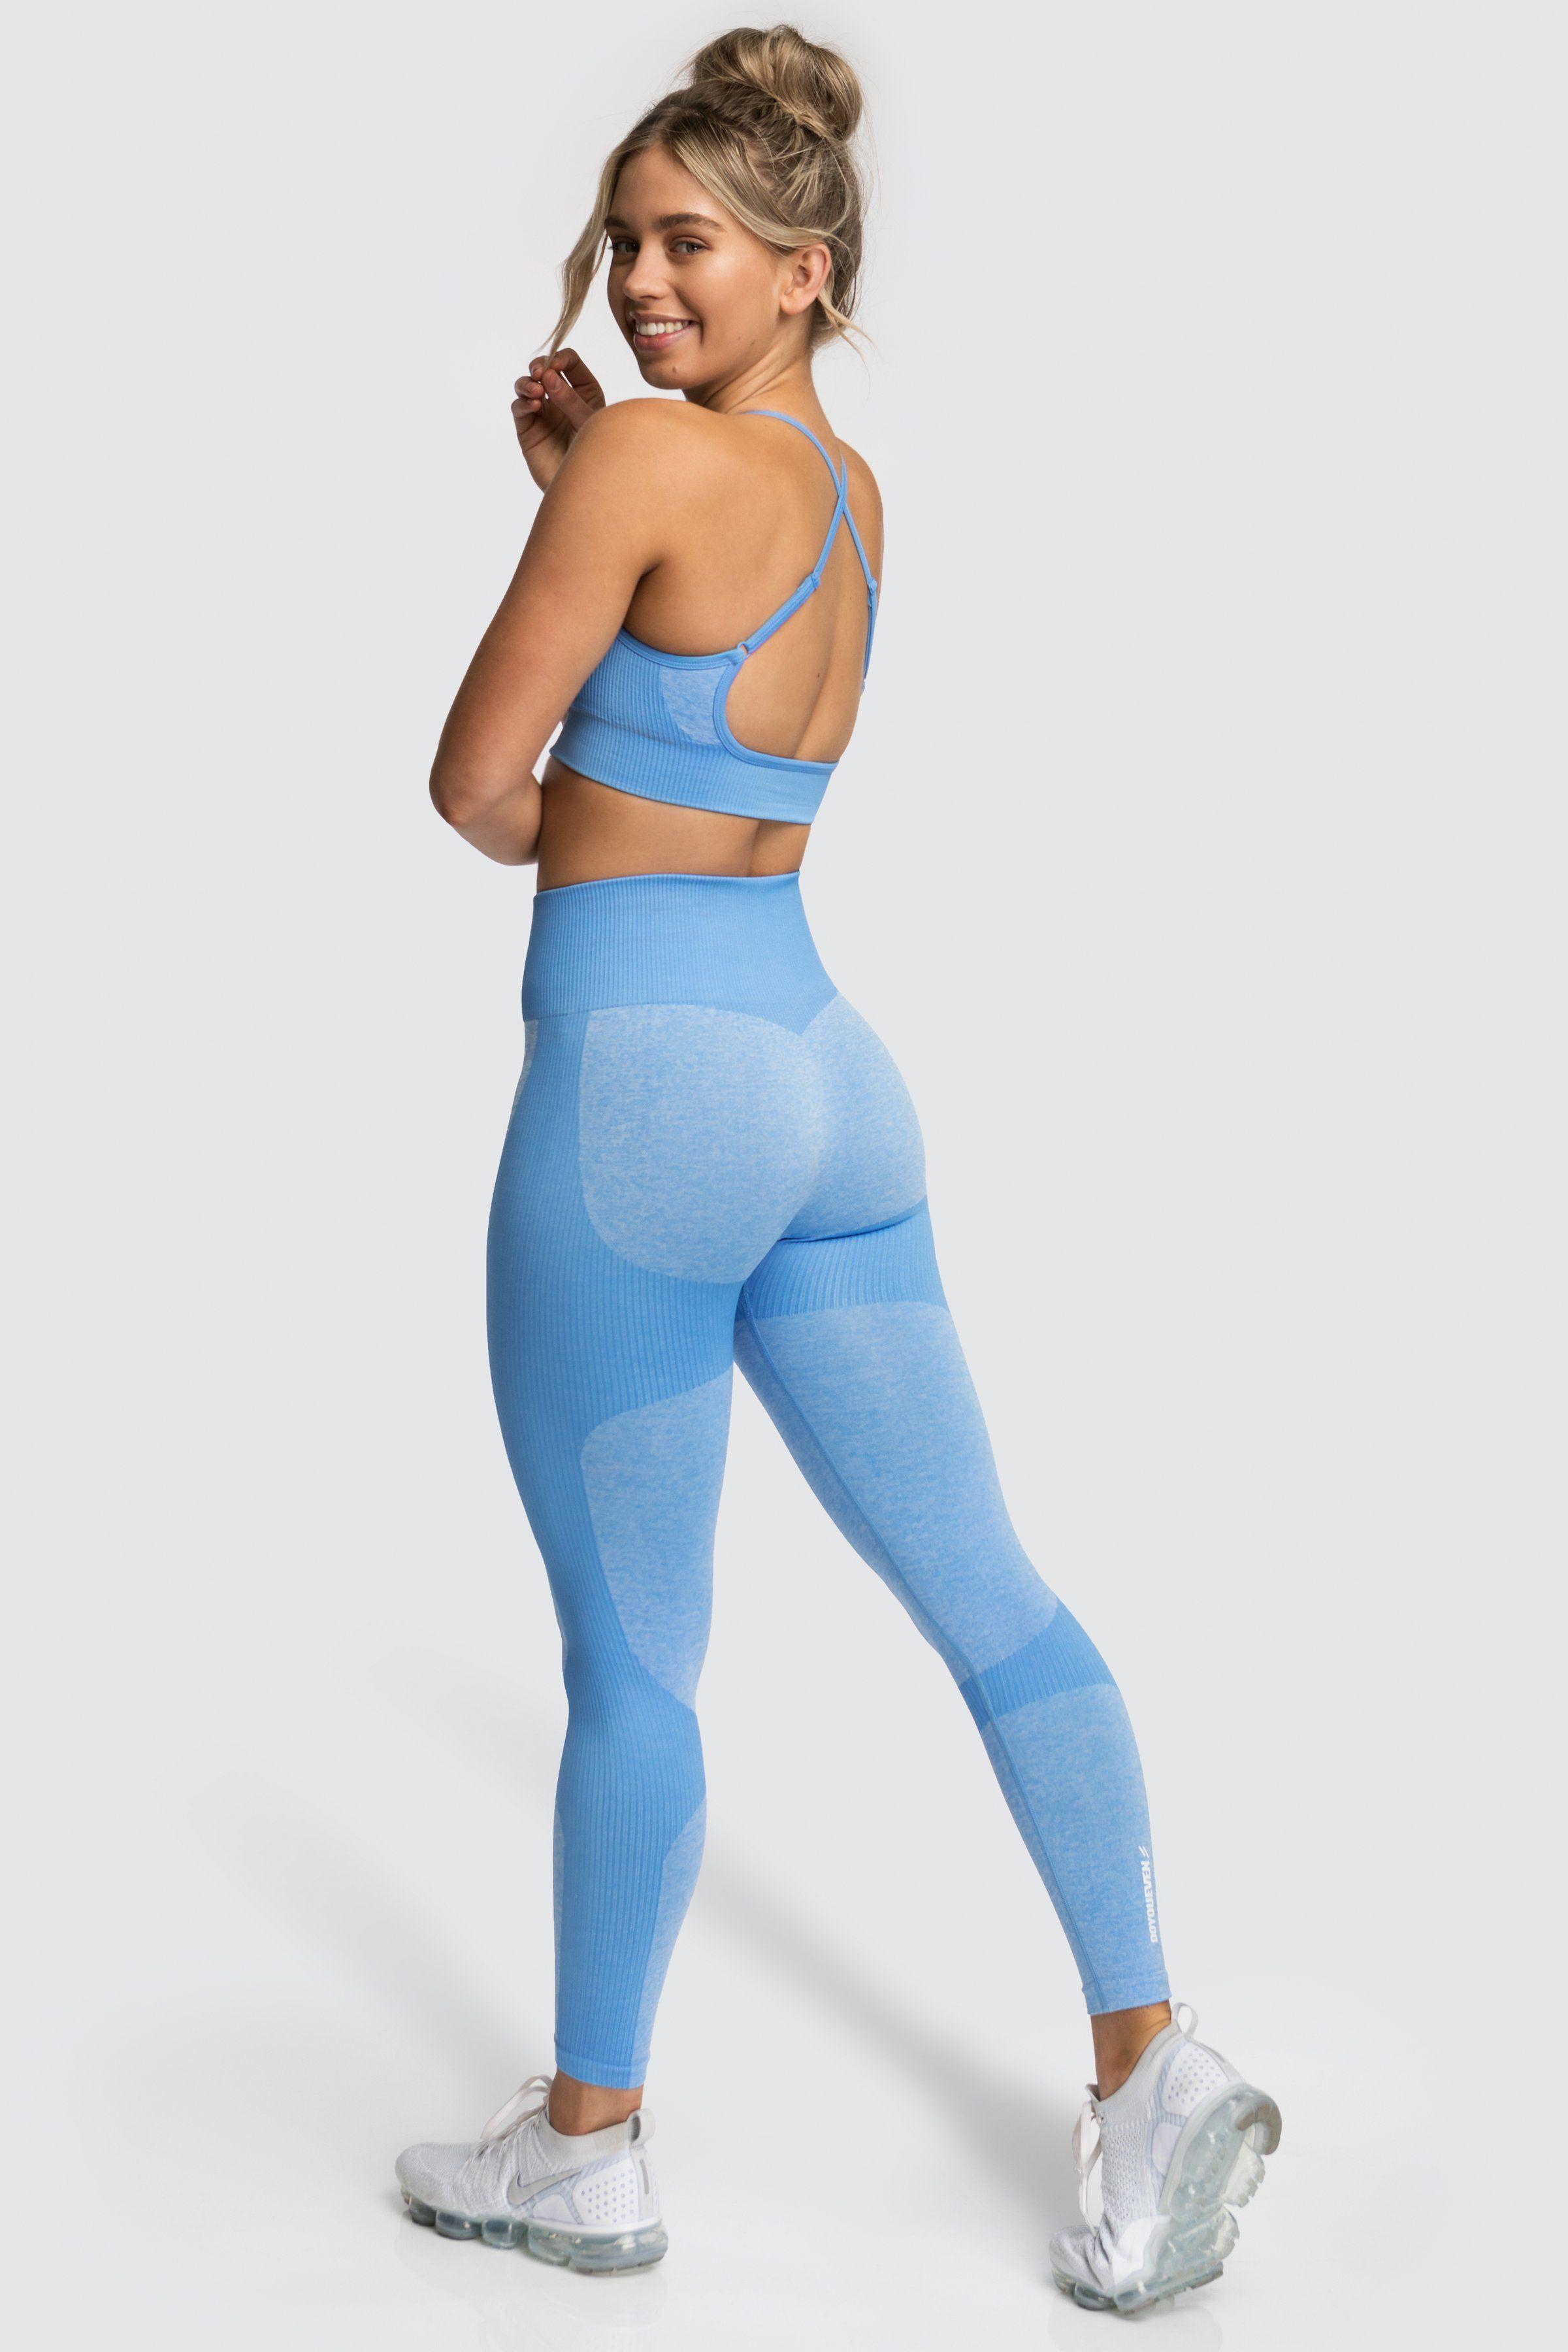 9367a30ee3 Impact Seamless Leggings - Sky Blue in 2019 | Women's | Seamless ...